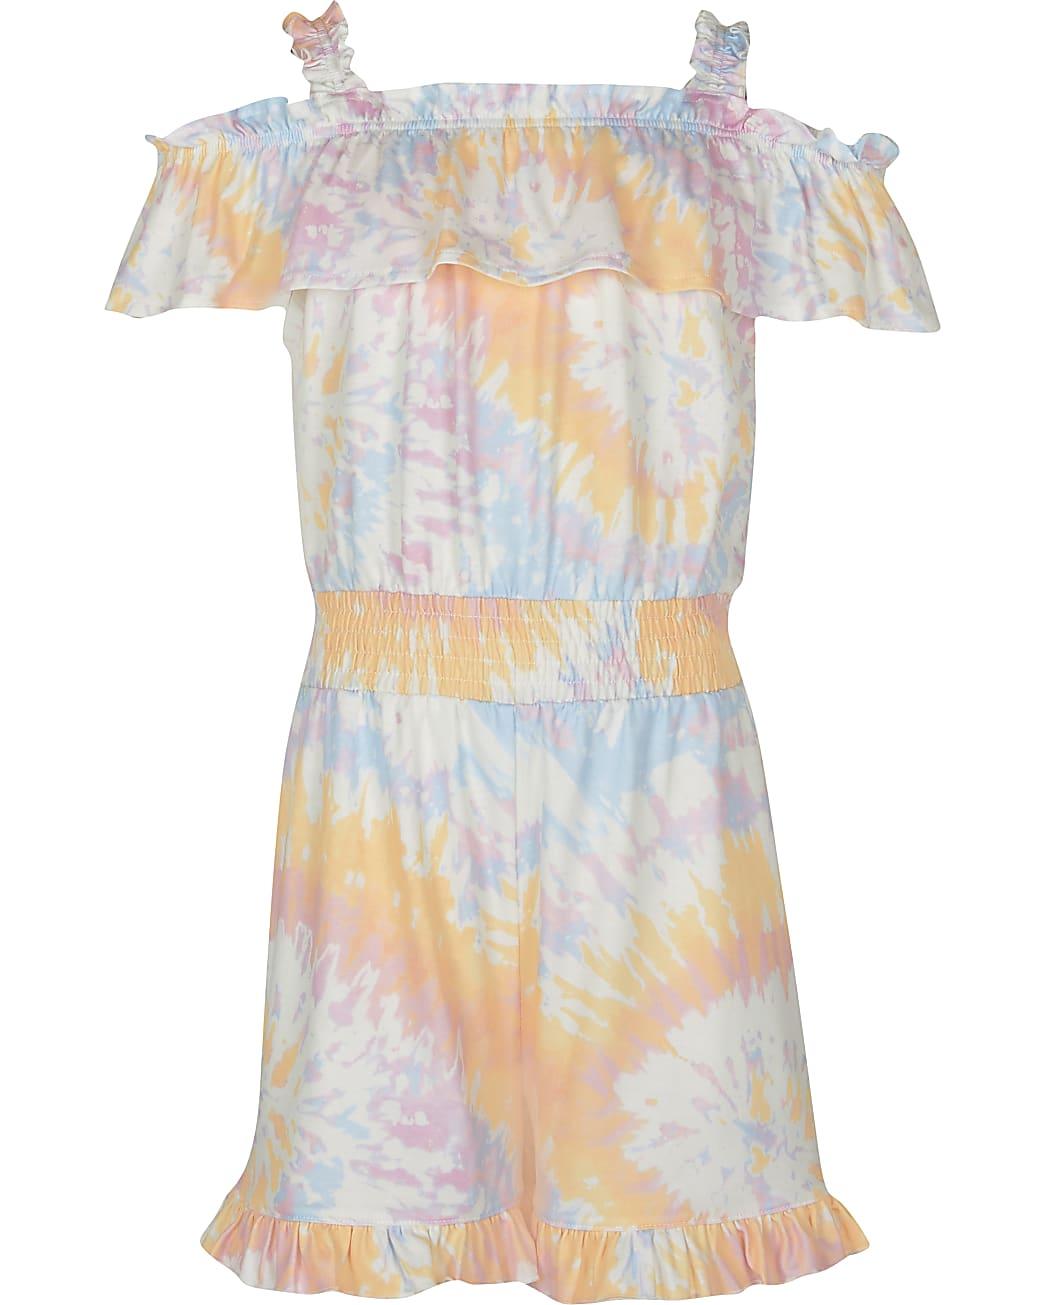 Girls orange tie dye playsuit